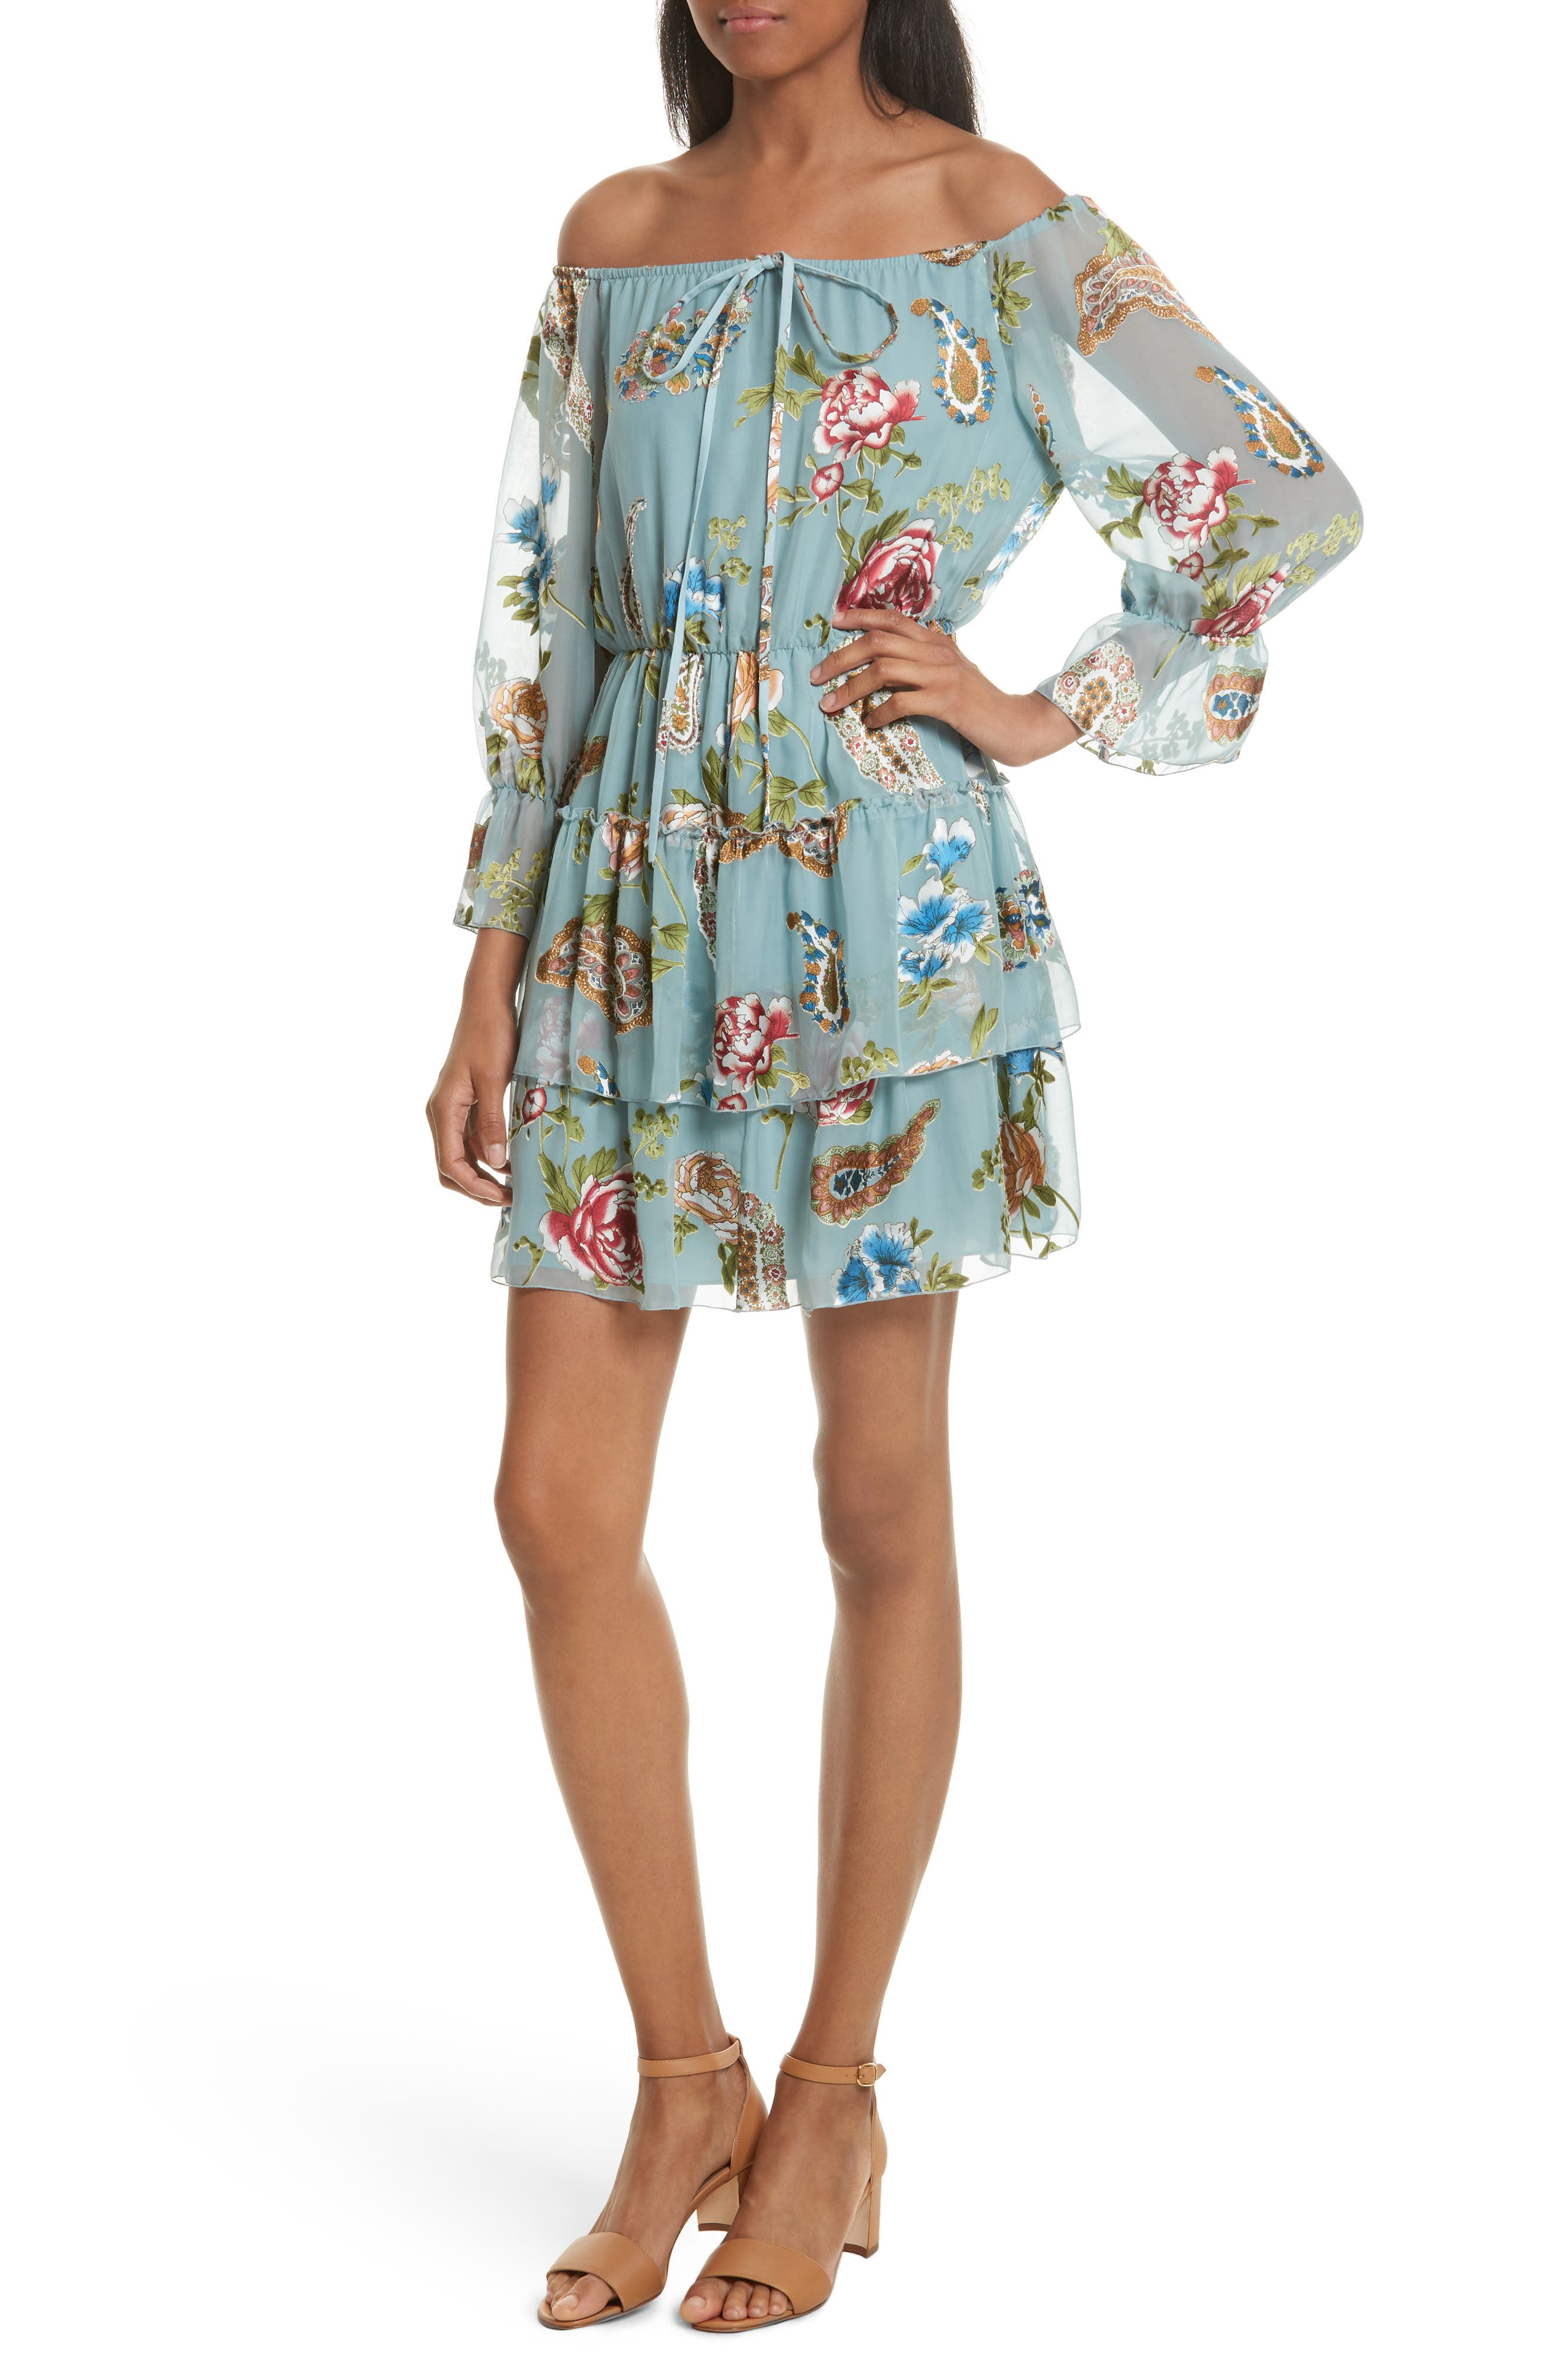 Alternate Image 1 Selected - Alice + Olivia Waylon Off the Shoulder Blouson Dress